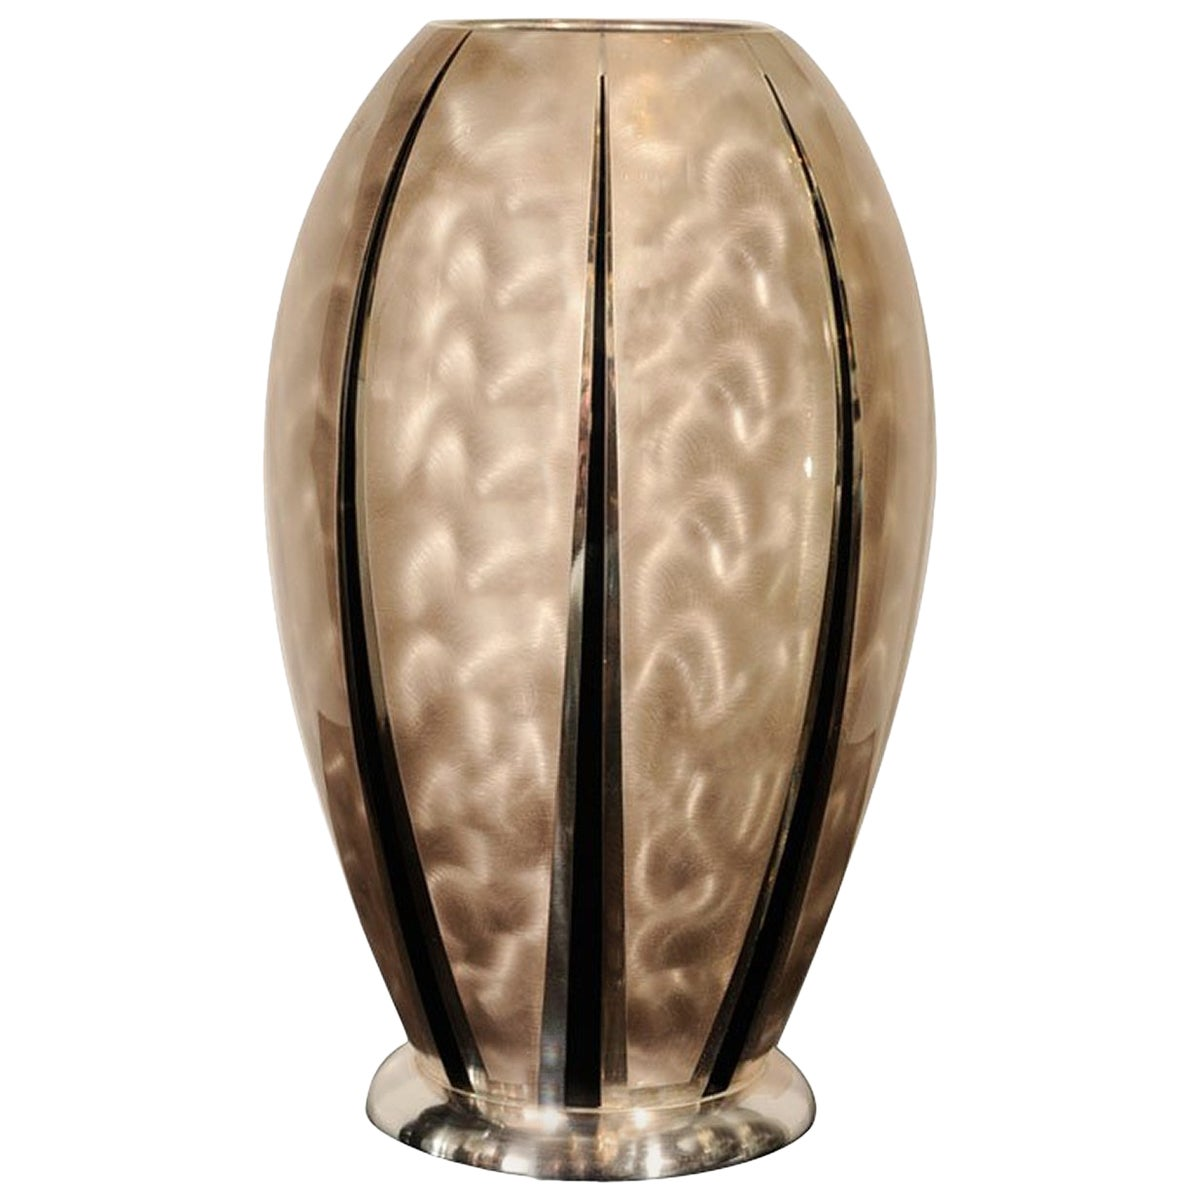 Large Art Deco WMF Ikora Vase